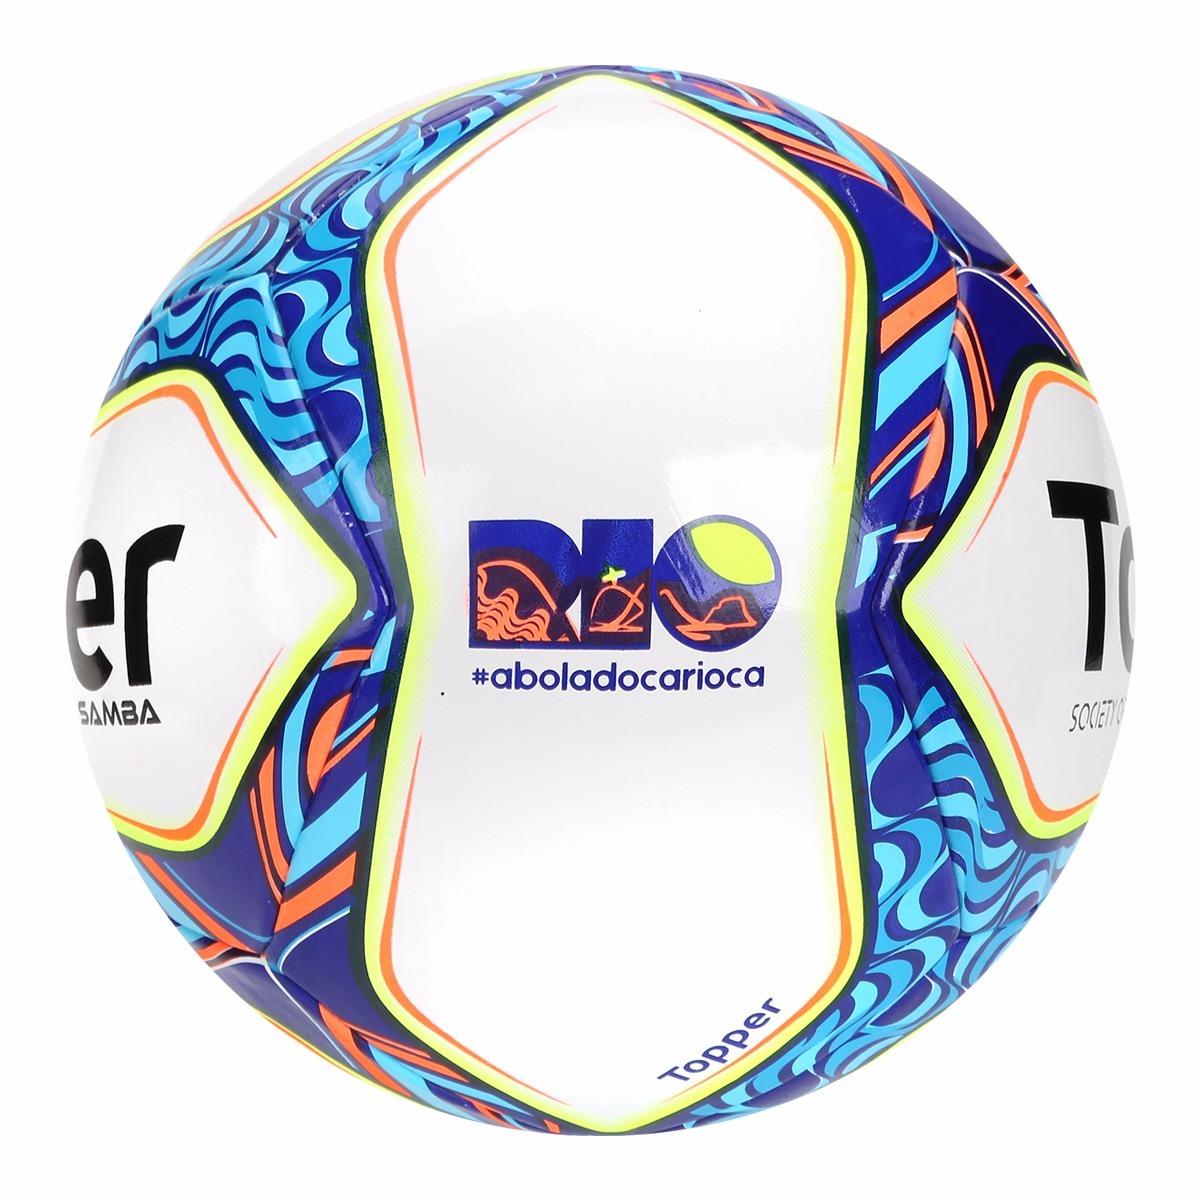 ff7438fb921db bola topper futebol society oficial - grama sintética samba. Carregando zoom .